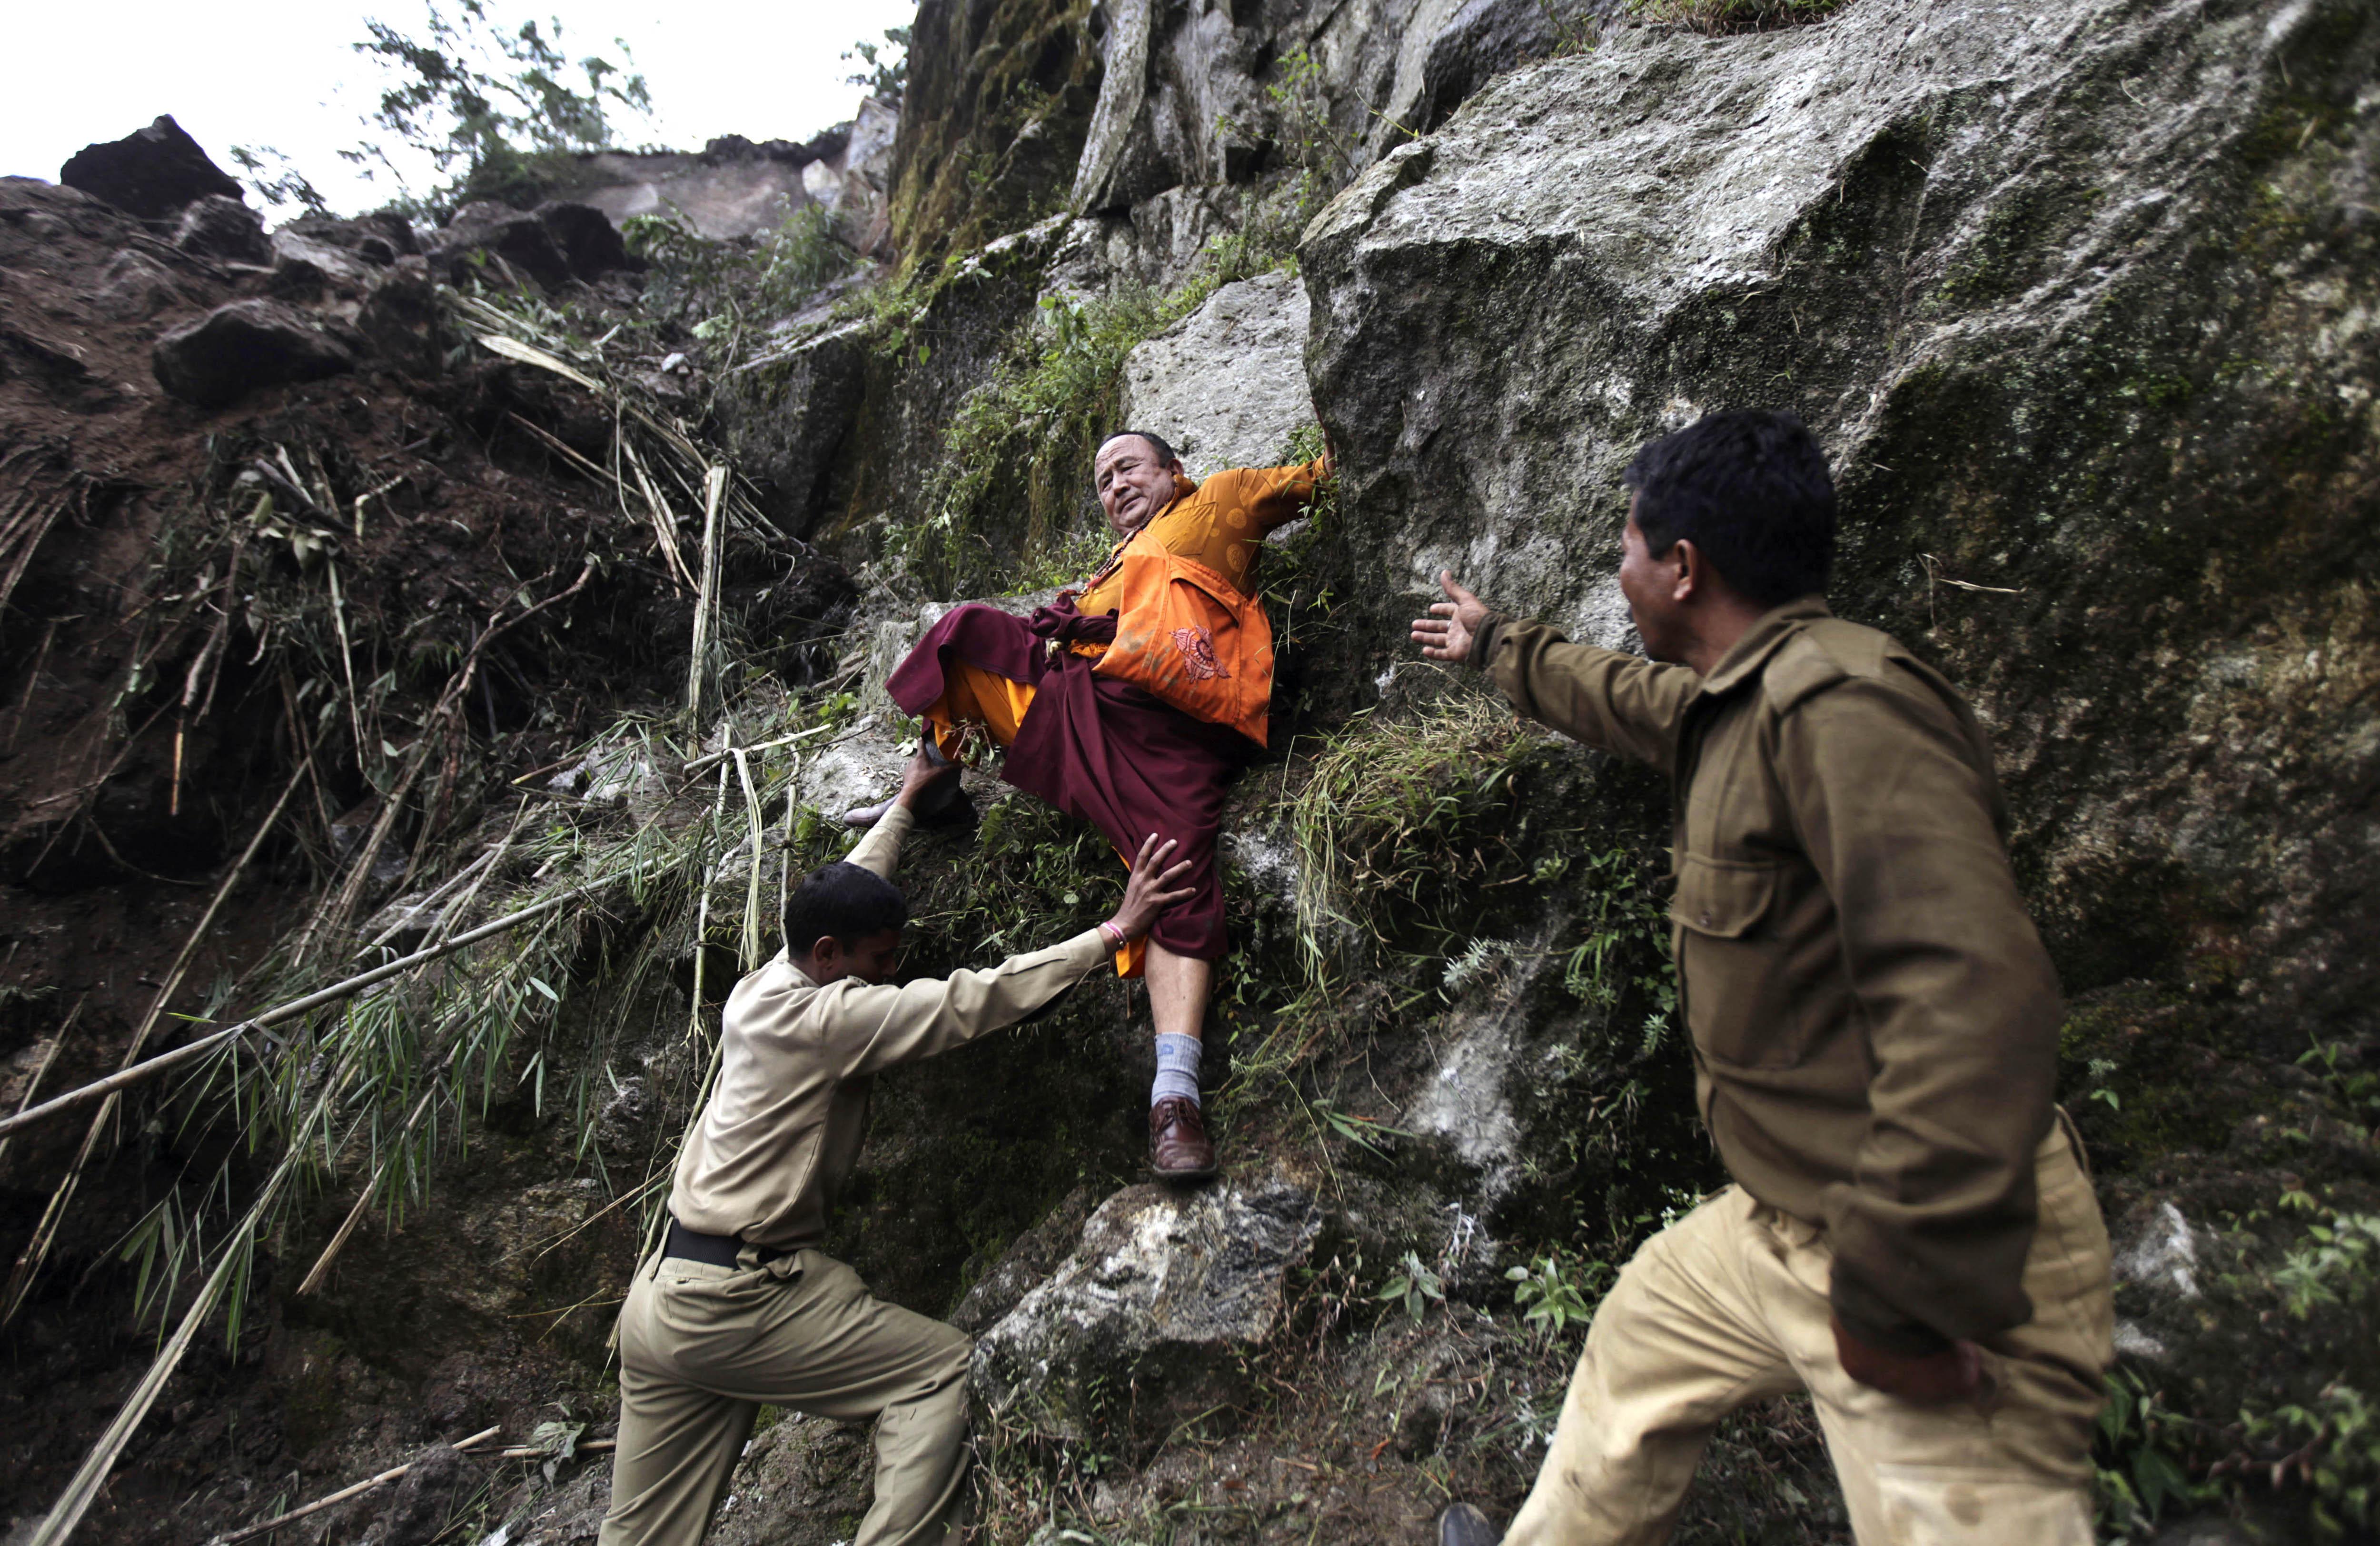 Himalayan earthquake death toll hits 81 - CBS News